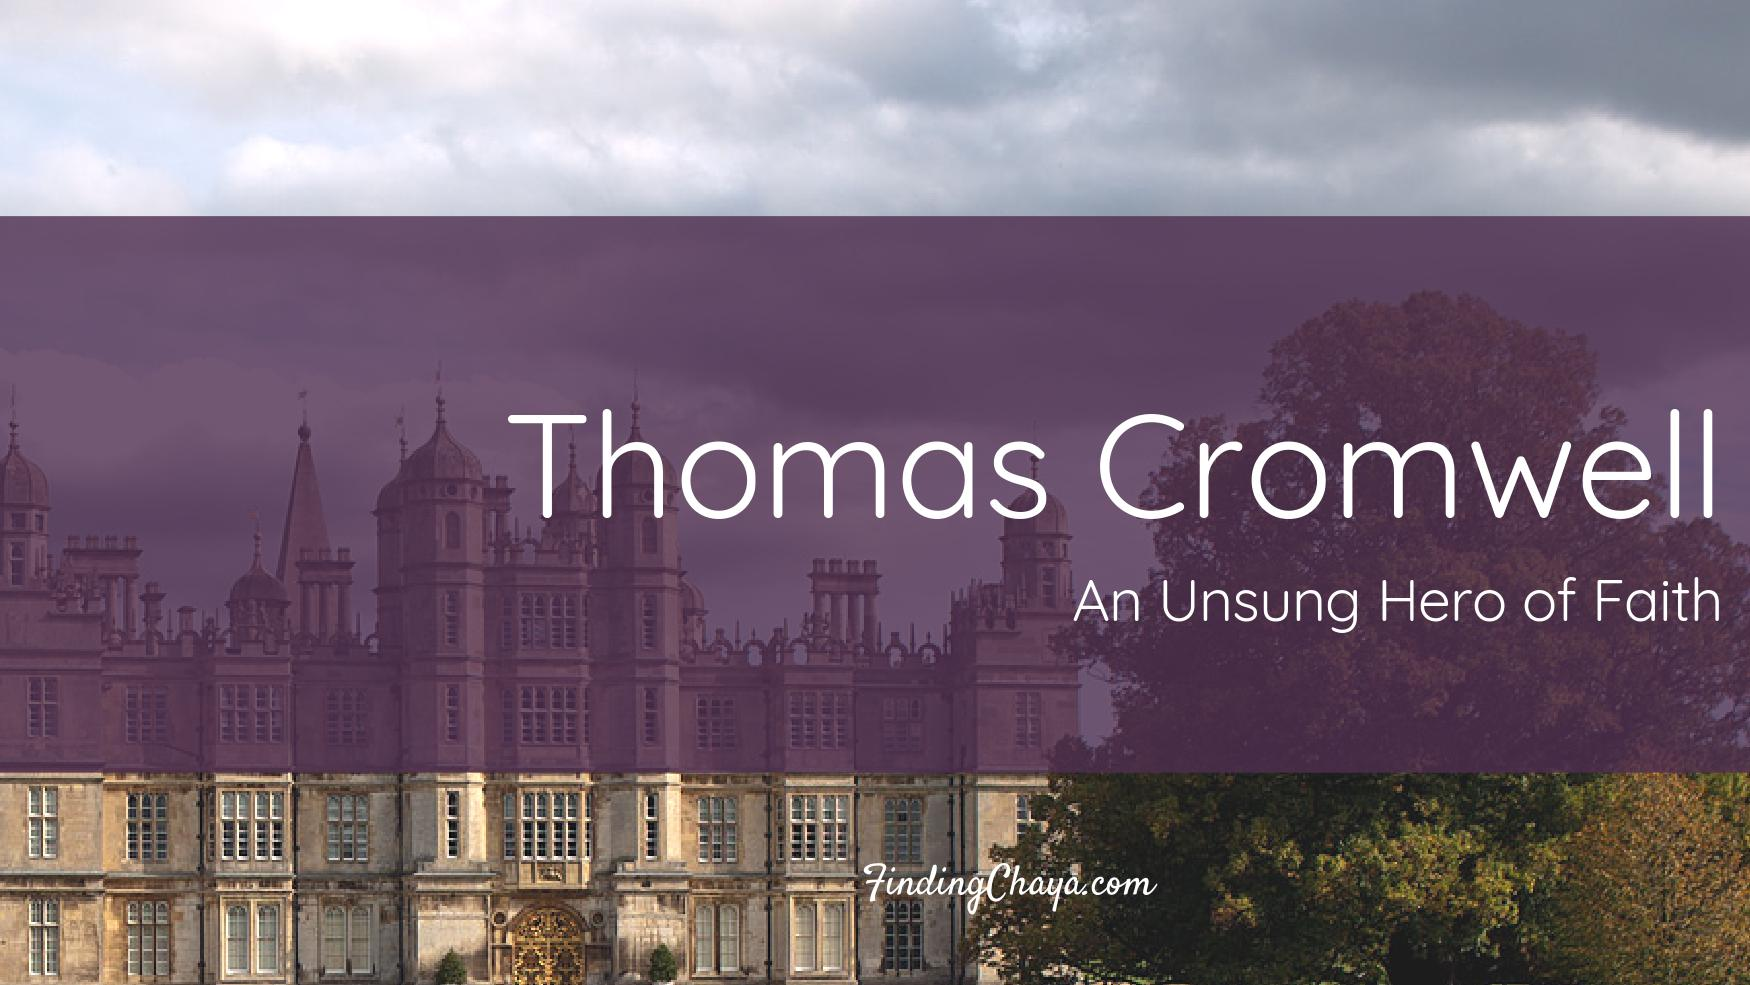 Thomas Cromwell: An Unsung Hero of Faith